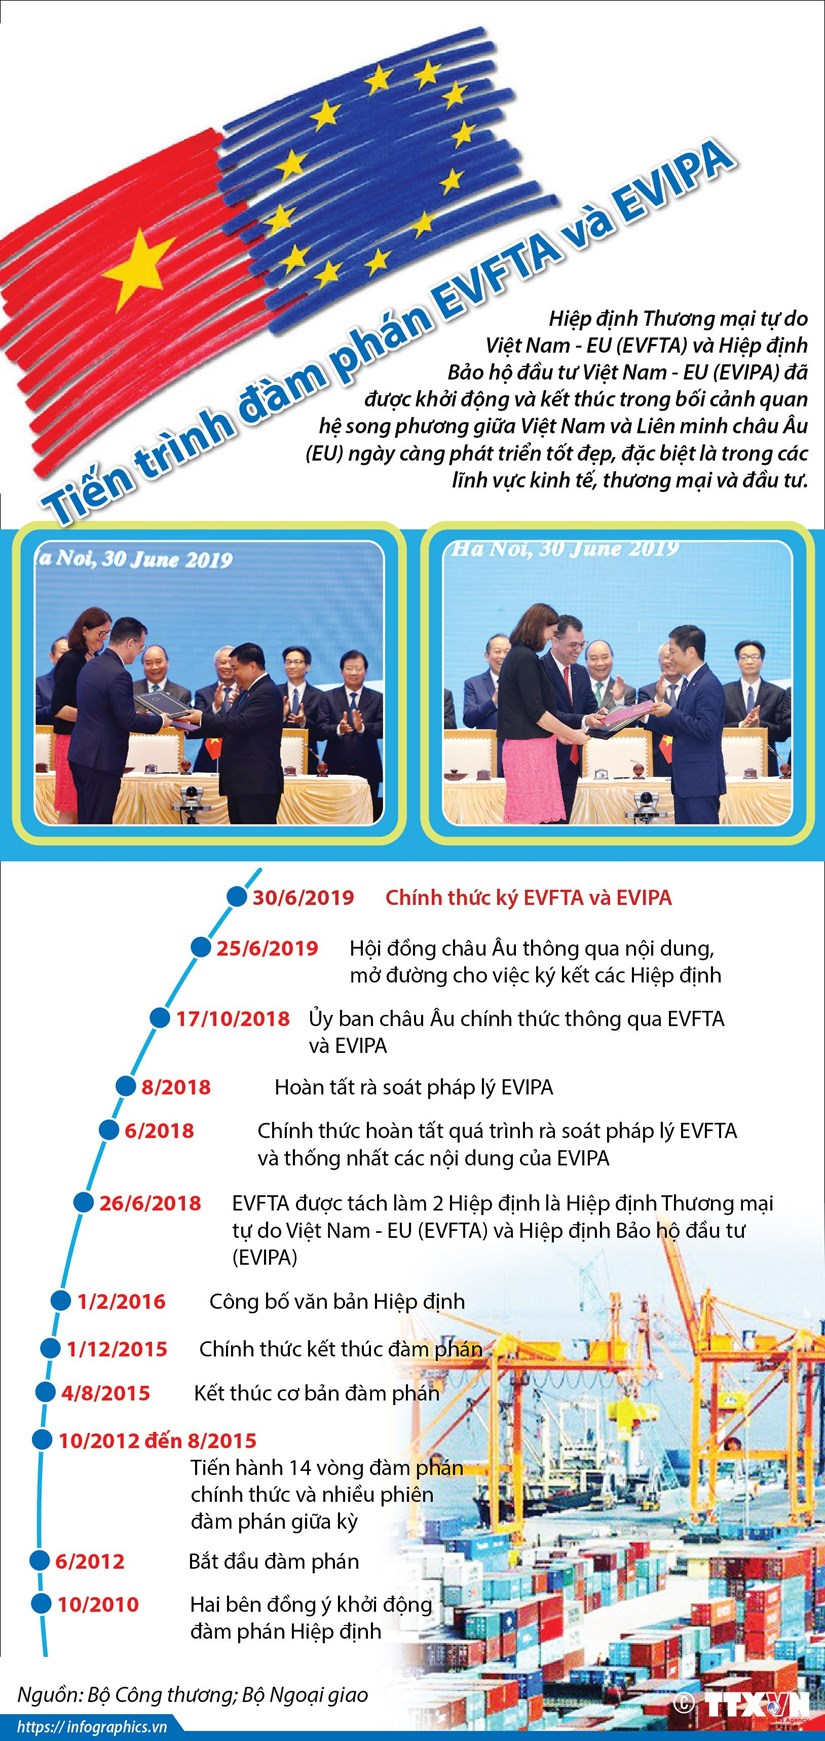 [Infographics] Tien trinh dam phan hai hiep dinh EVFTA va EVIPA hinh anh 1